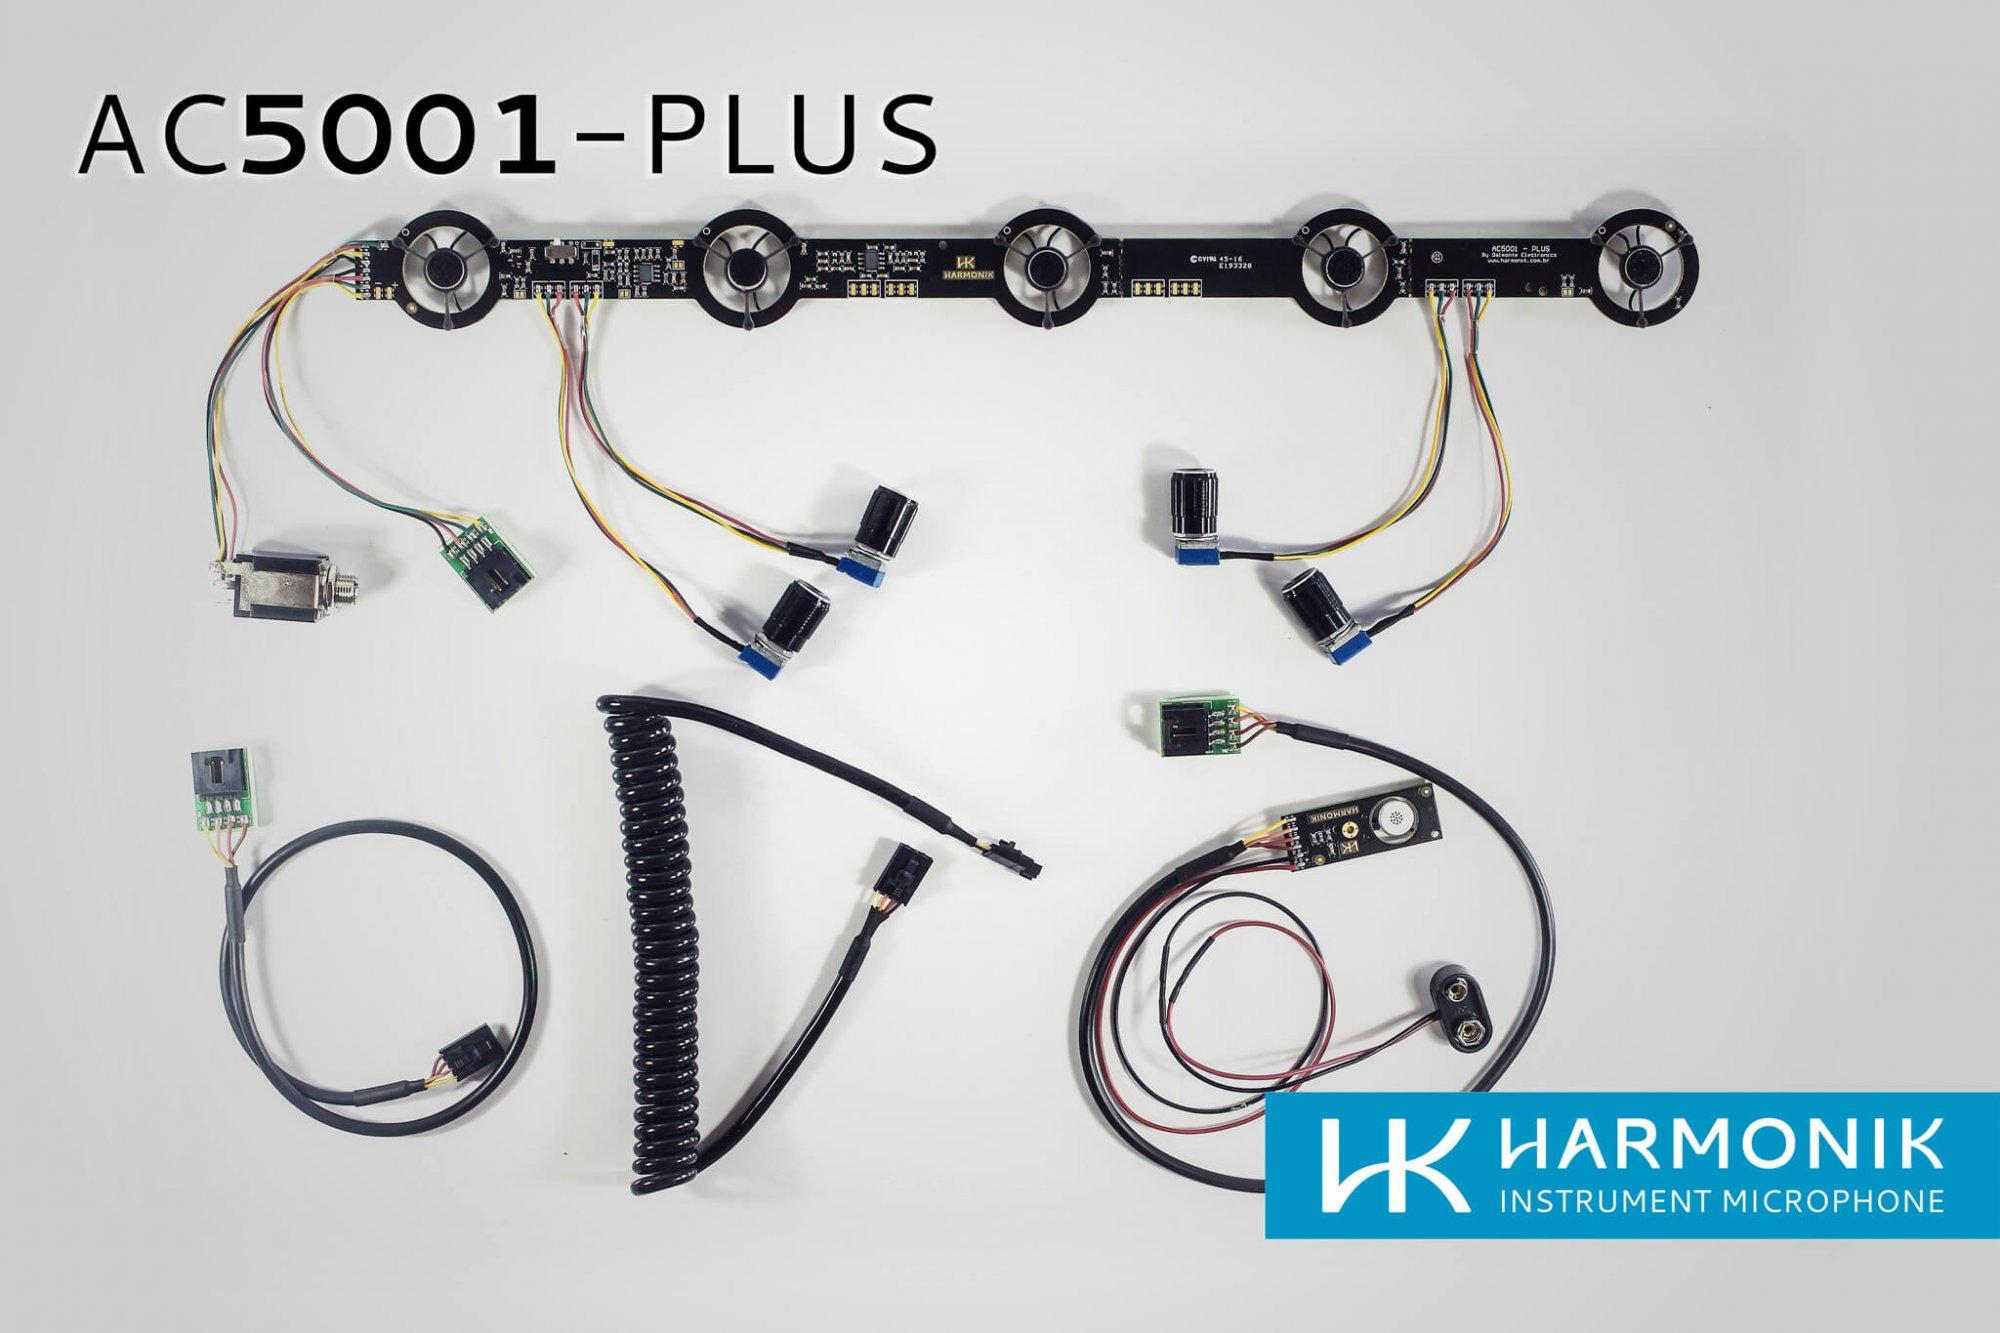 NEW Harmonik Microphone Kit AC5001-PLUS 5x1 Stereo or Mono with EQ